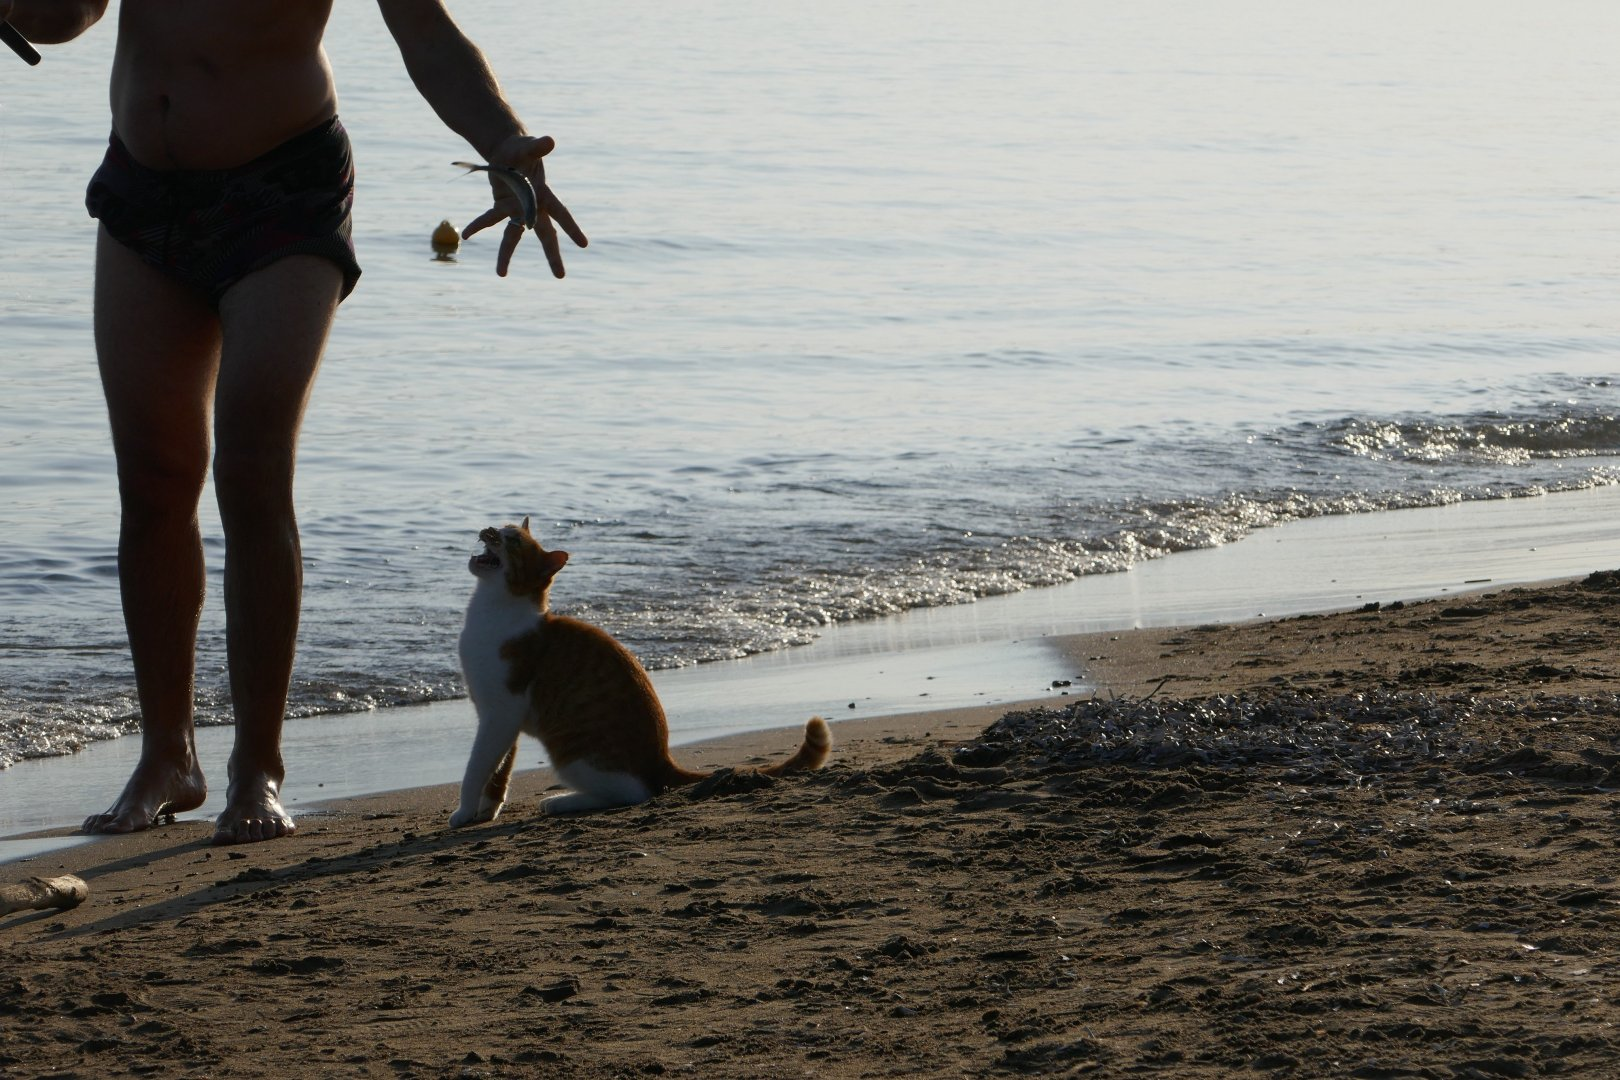 His human caught him a fish - Kalamaki beach, Zakynthos